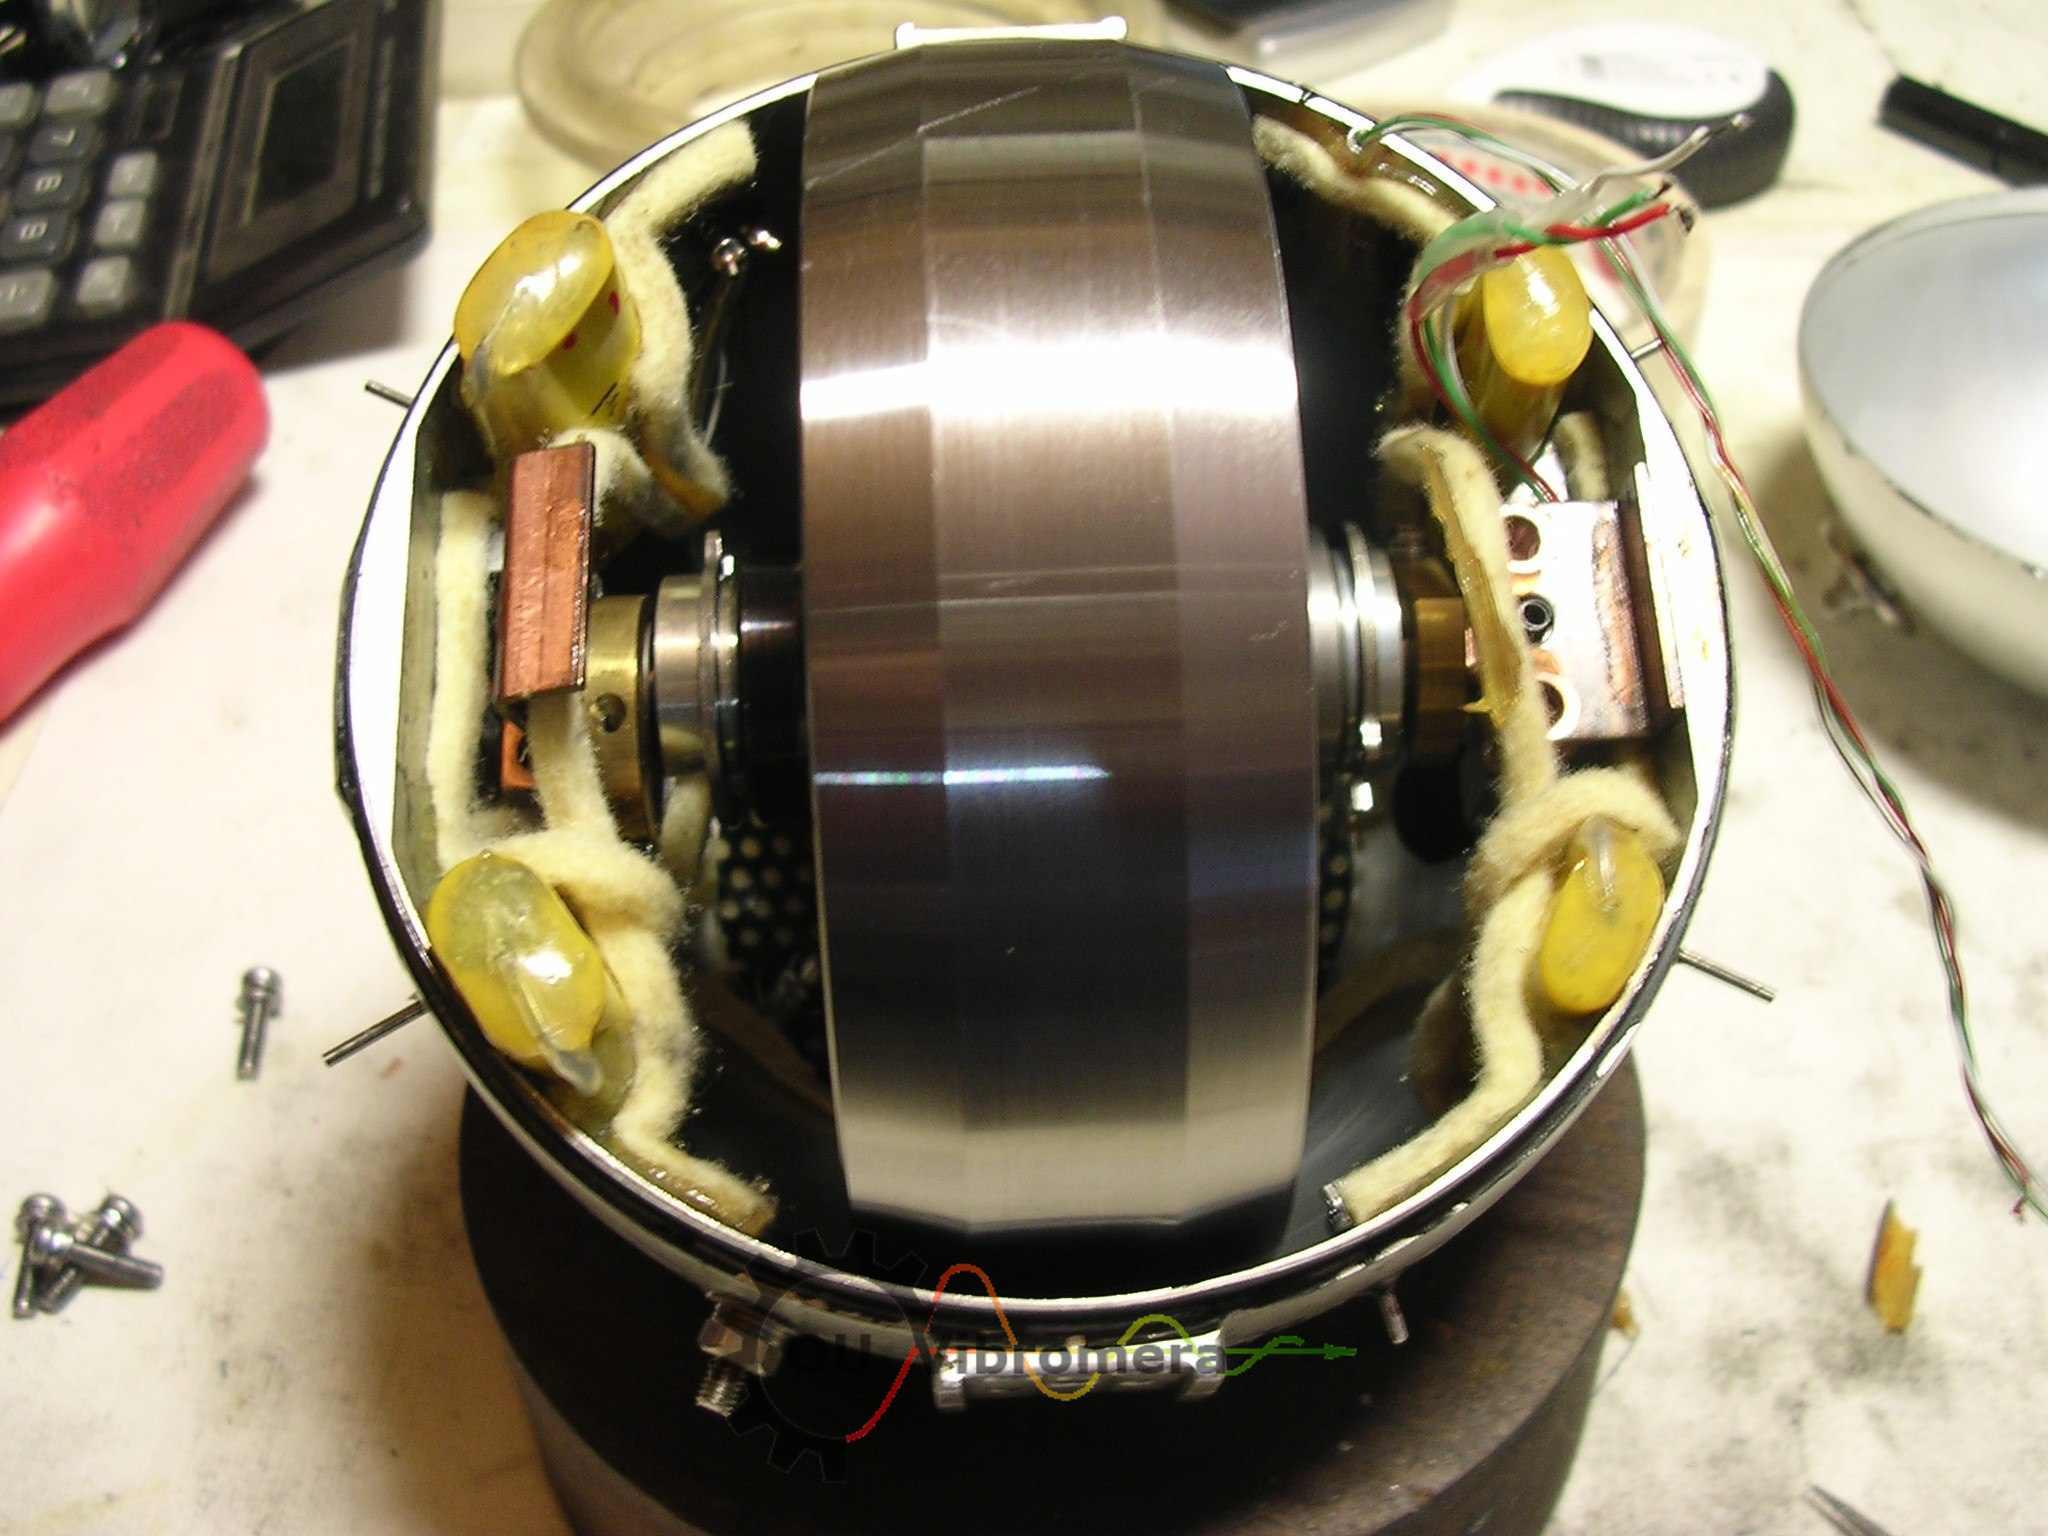 Gyroscopes balancing